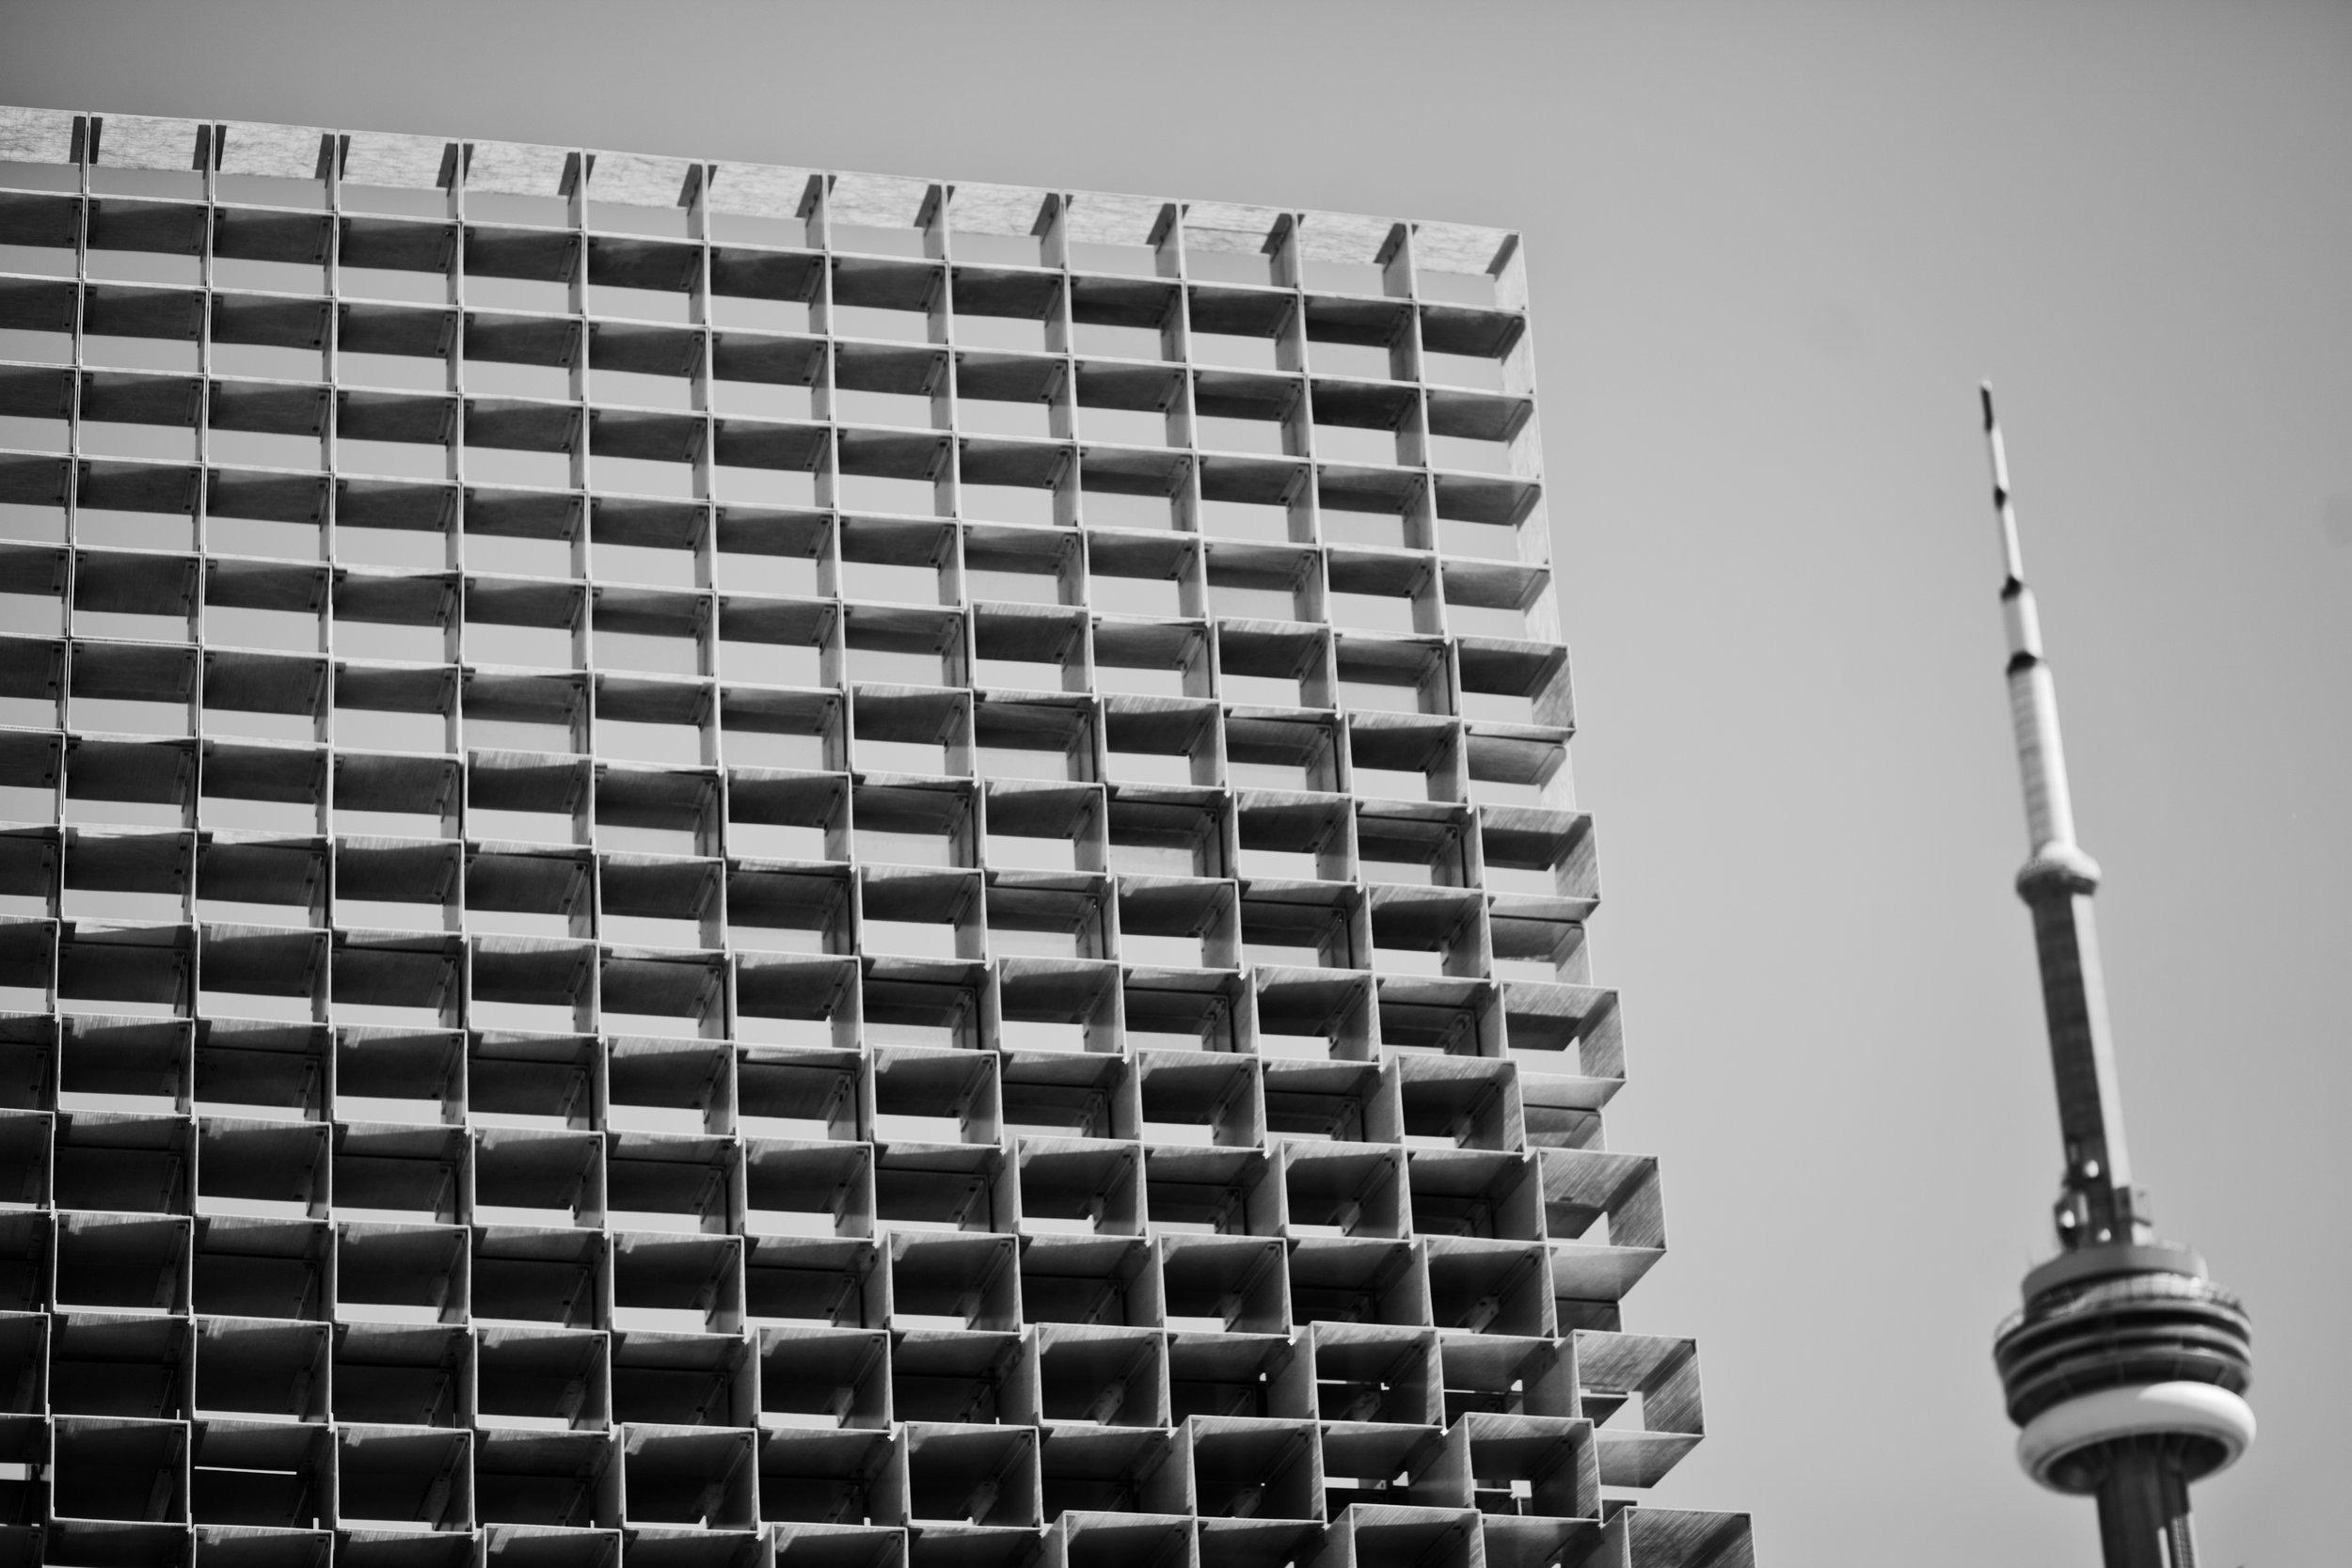 Unzipped pavilion Bjarke Ingels Toronto Architecture Toronto Architect Ontario Design Westfield Katia Marten Blogger After 50 CN Tower